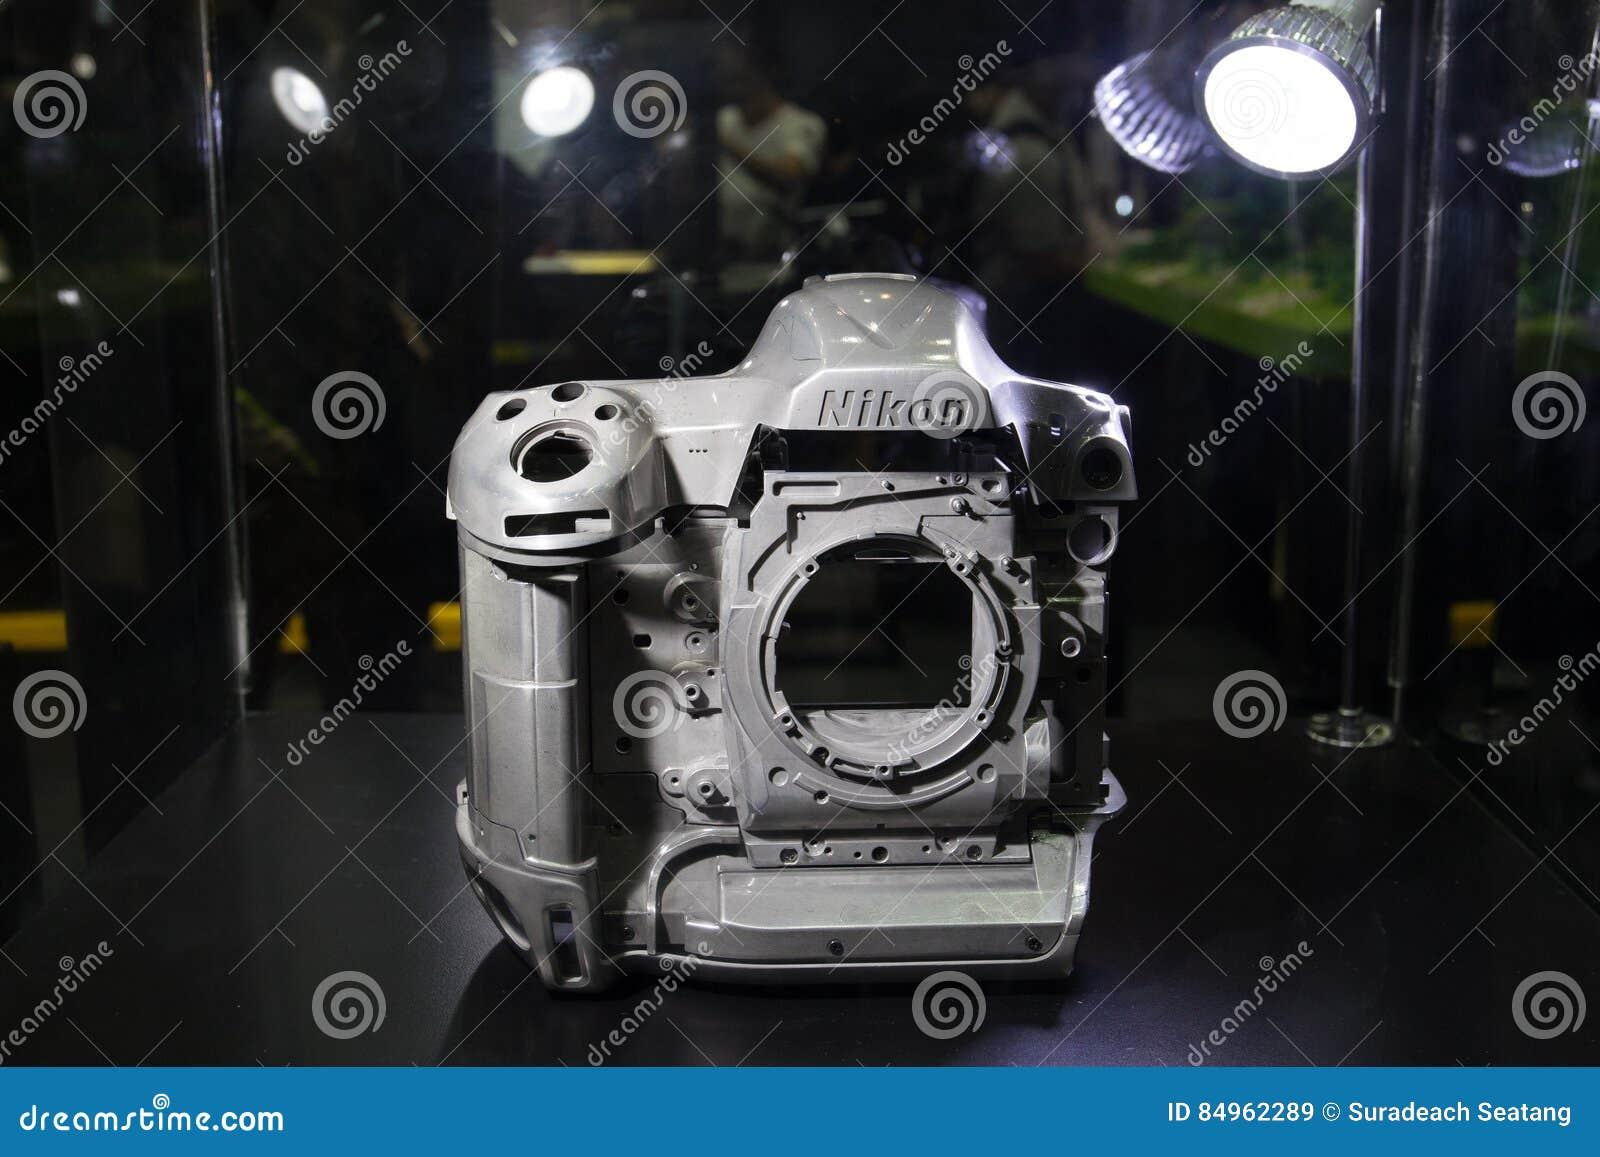 the prototype magnesium alloy of nikon camera editorial stock image